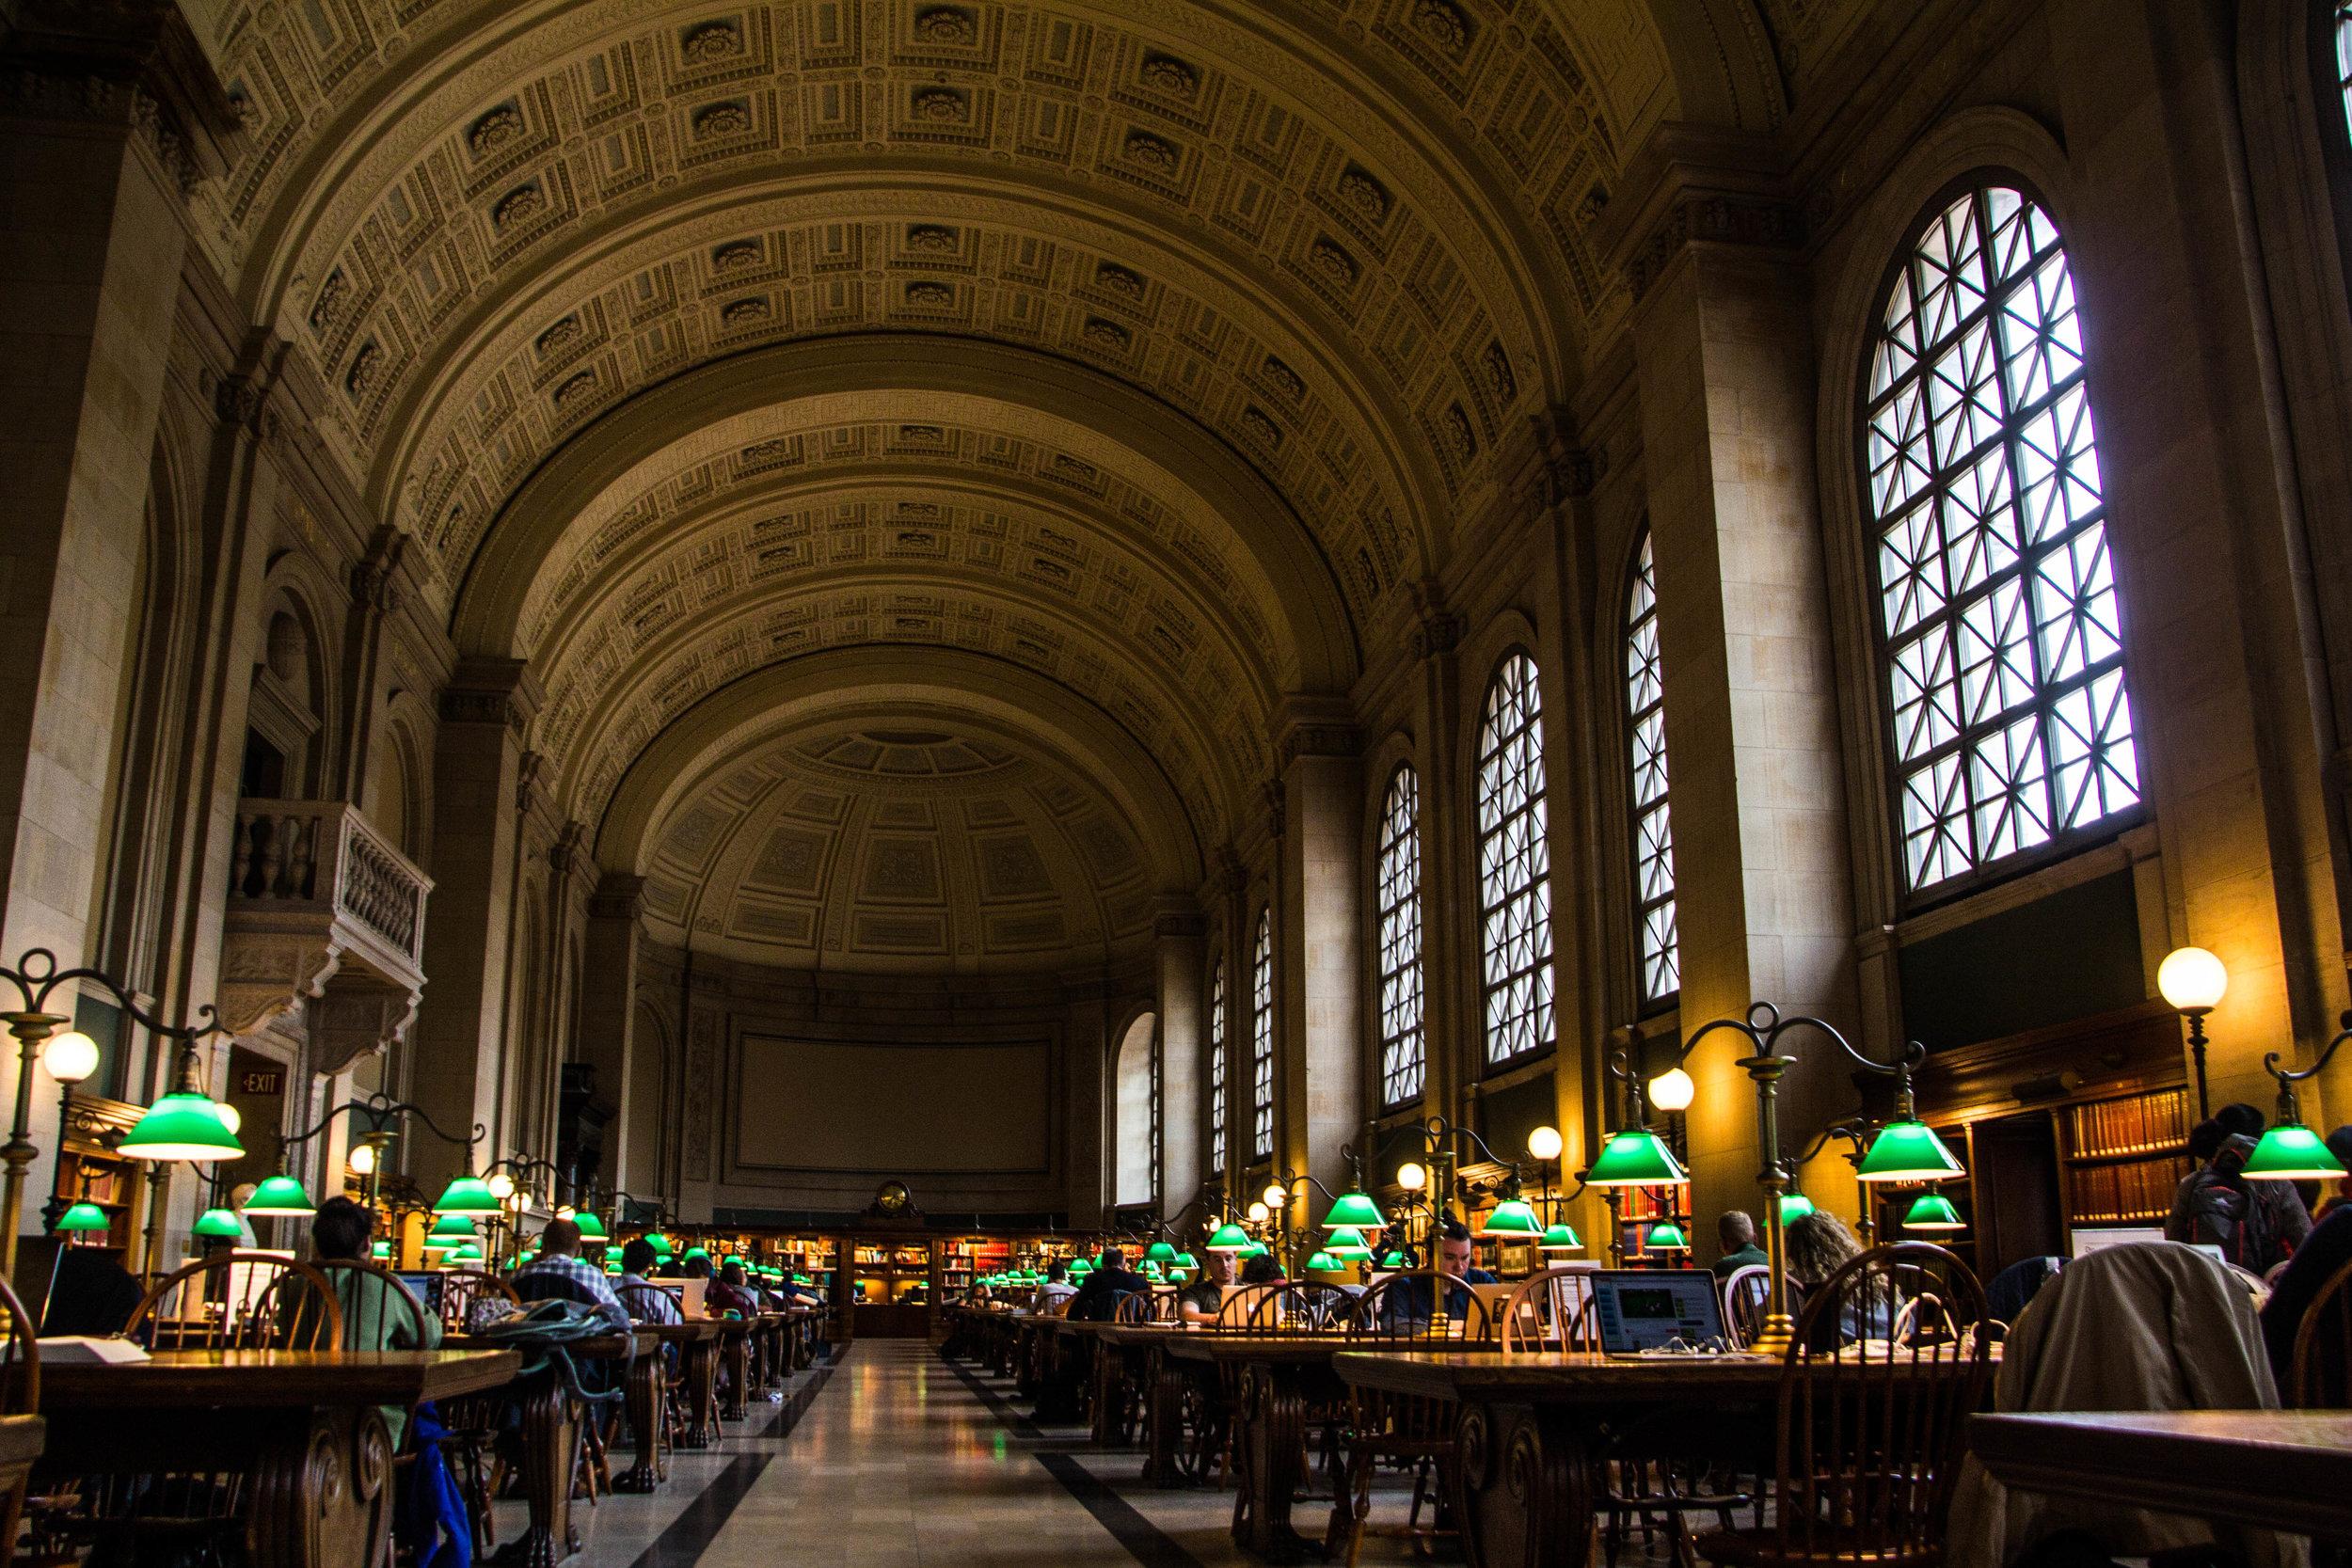 boston-public-library-photography-29.jpg